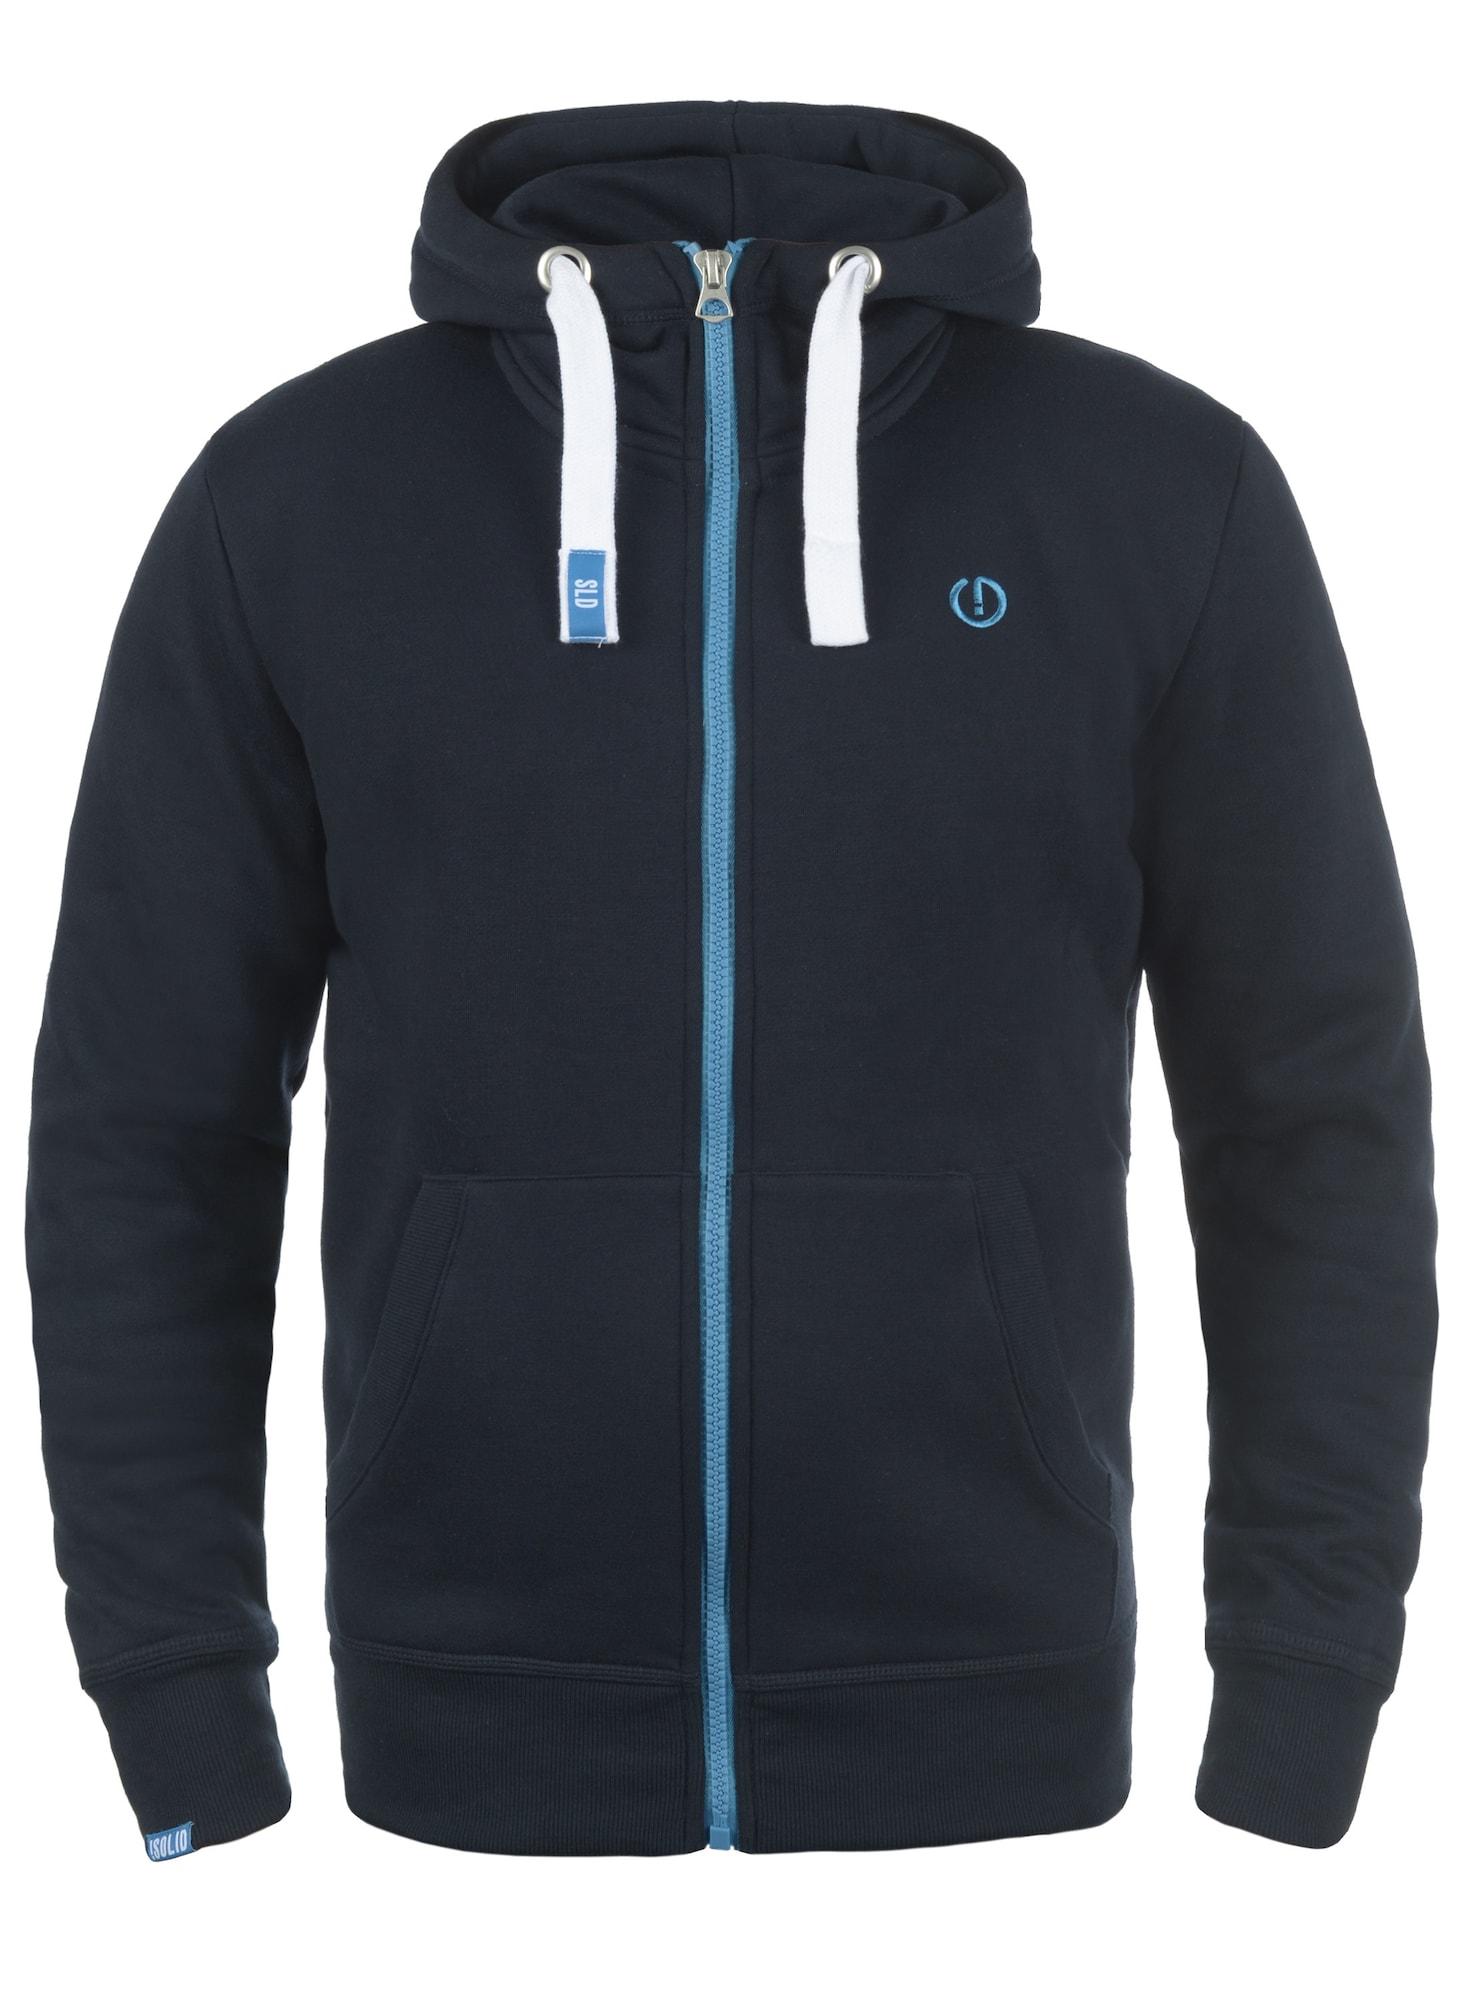 Kapuzensweatjacke 'Benn High-Neck' | Bekleidung > Sweatshirts & -jacken > Sweatjacken | Blau - Dunkelblau | !solid